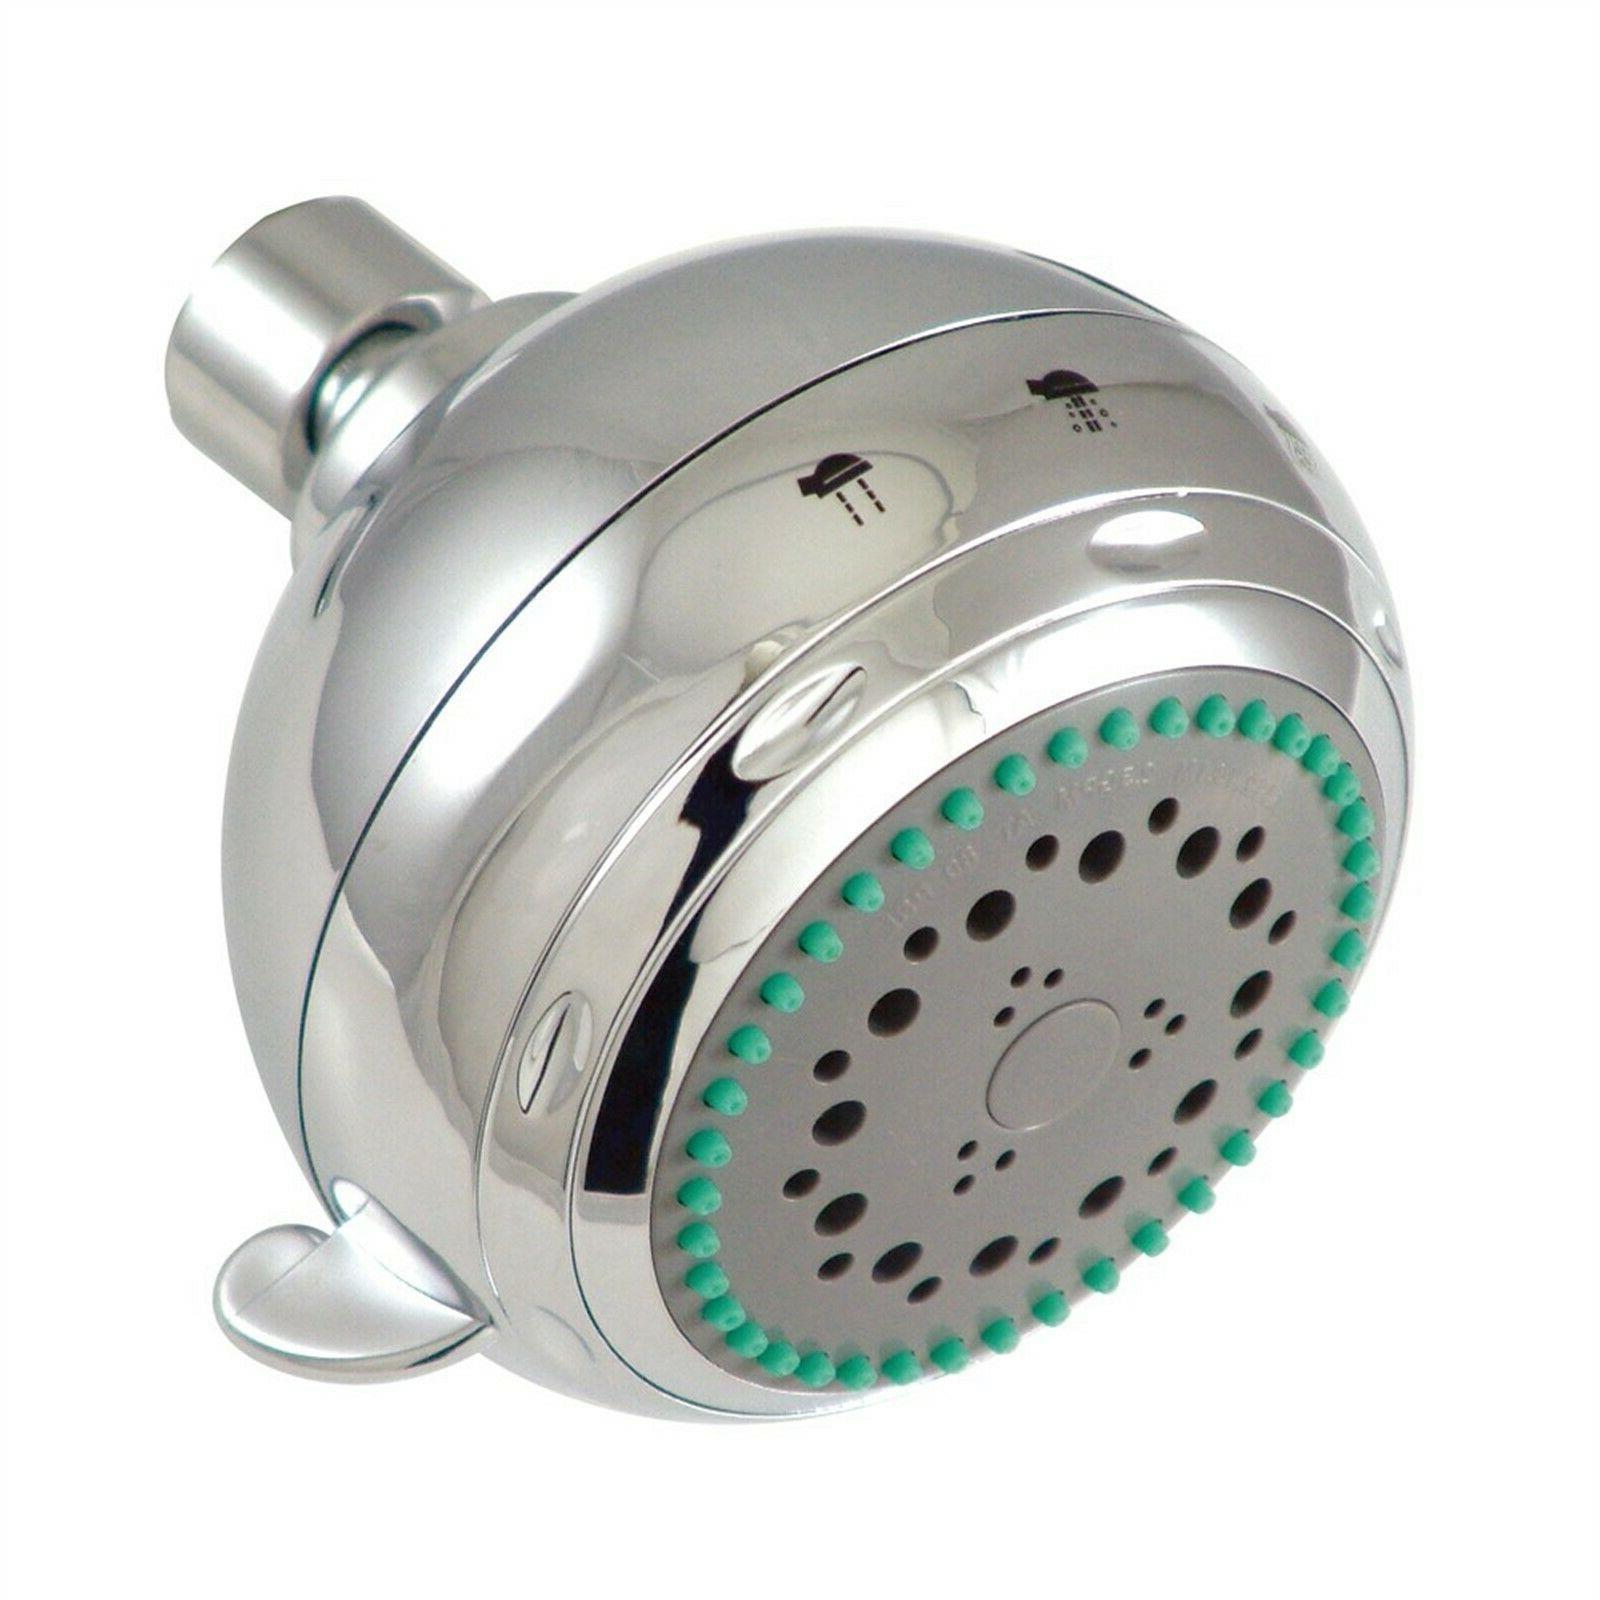 showerheads chrome adjustable fixed shower head kx1652